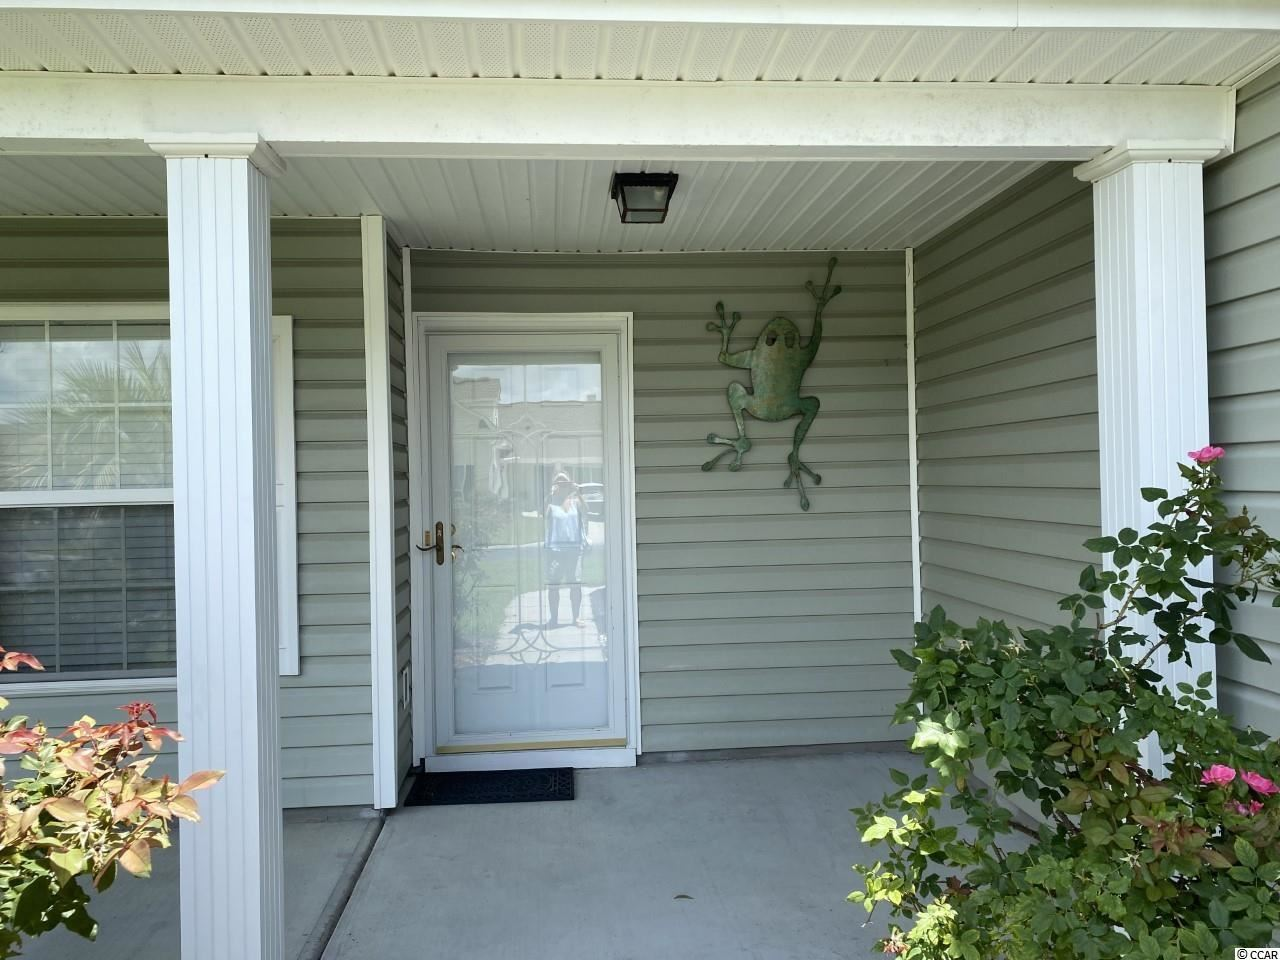 943 Corn Planters Circle, Calabash, NC, 28467, The Farm |Brunswick NC Home For Sale